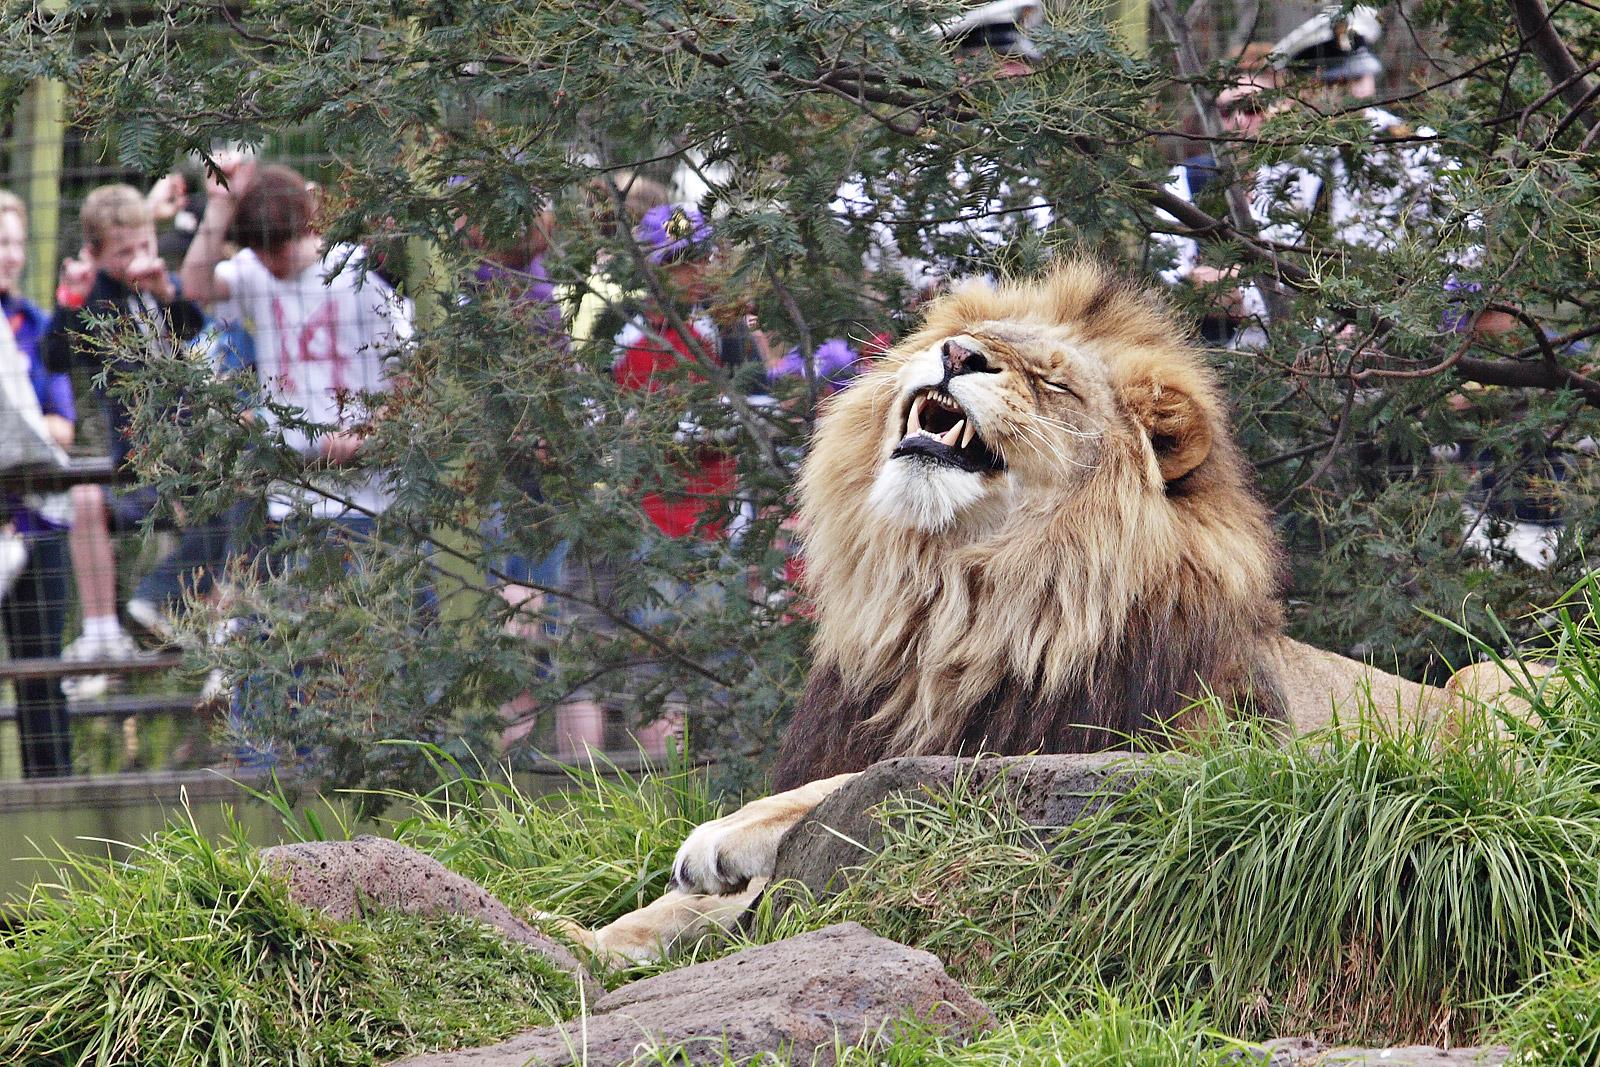 File:Lion - melbourne zoo.jpg - Wikipedia